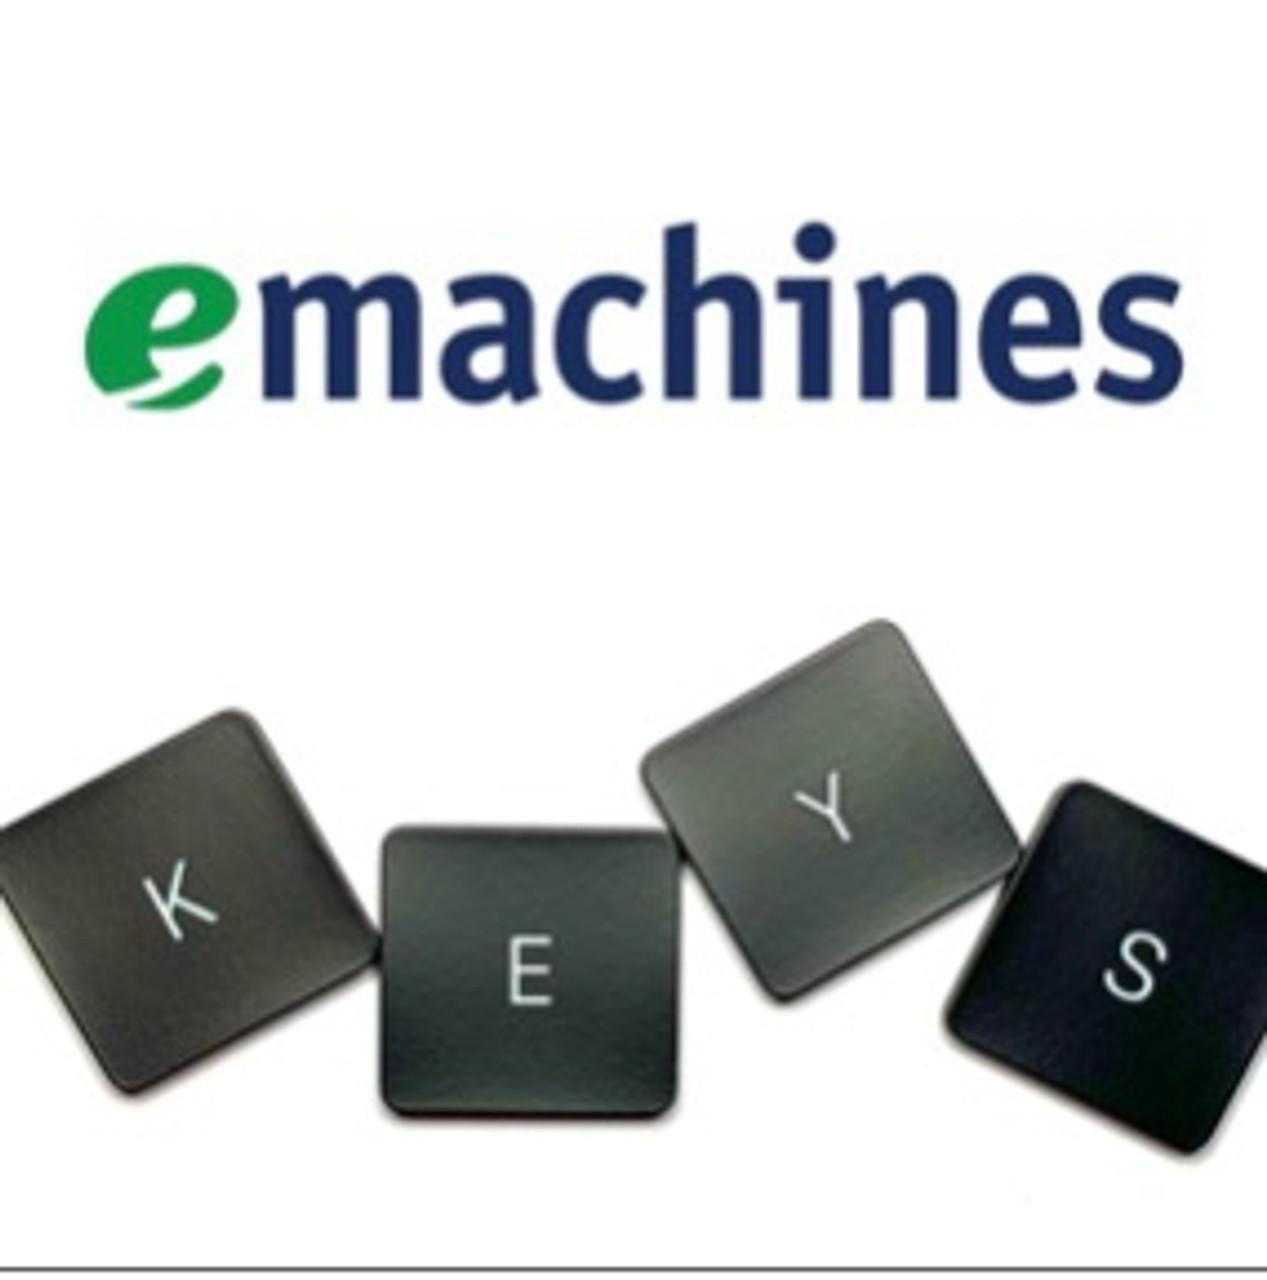 emachines em250 laptop key